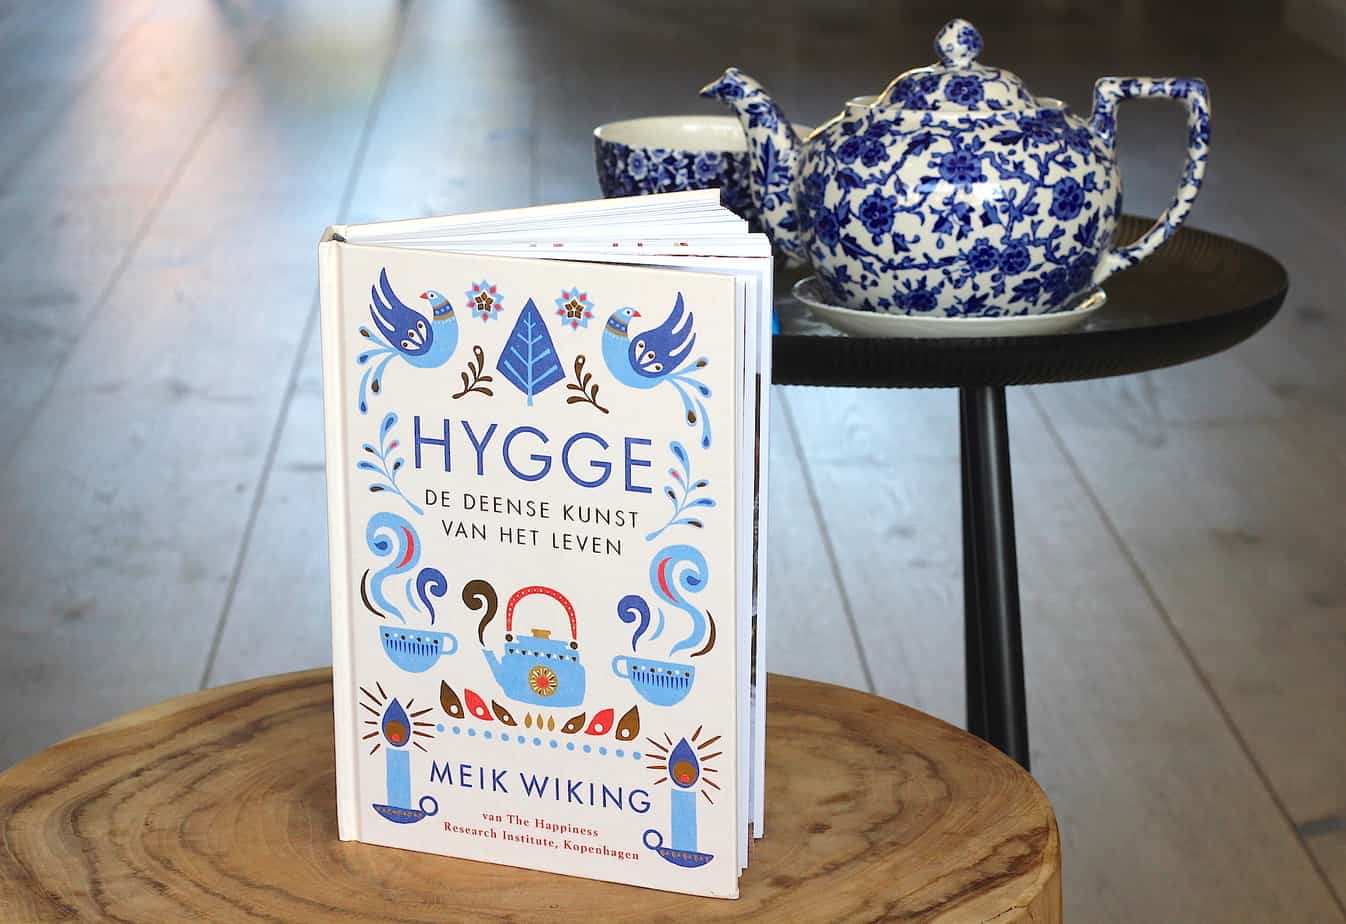 HYGGE | ENJOY! The Good Life